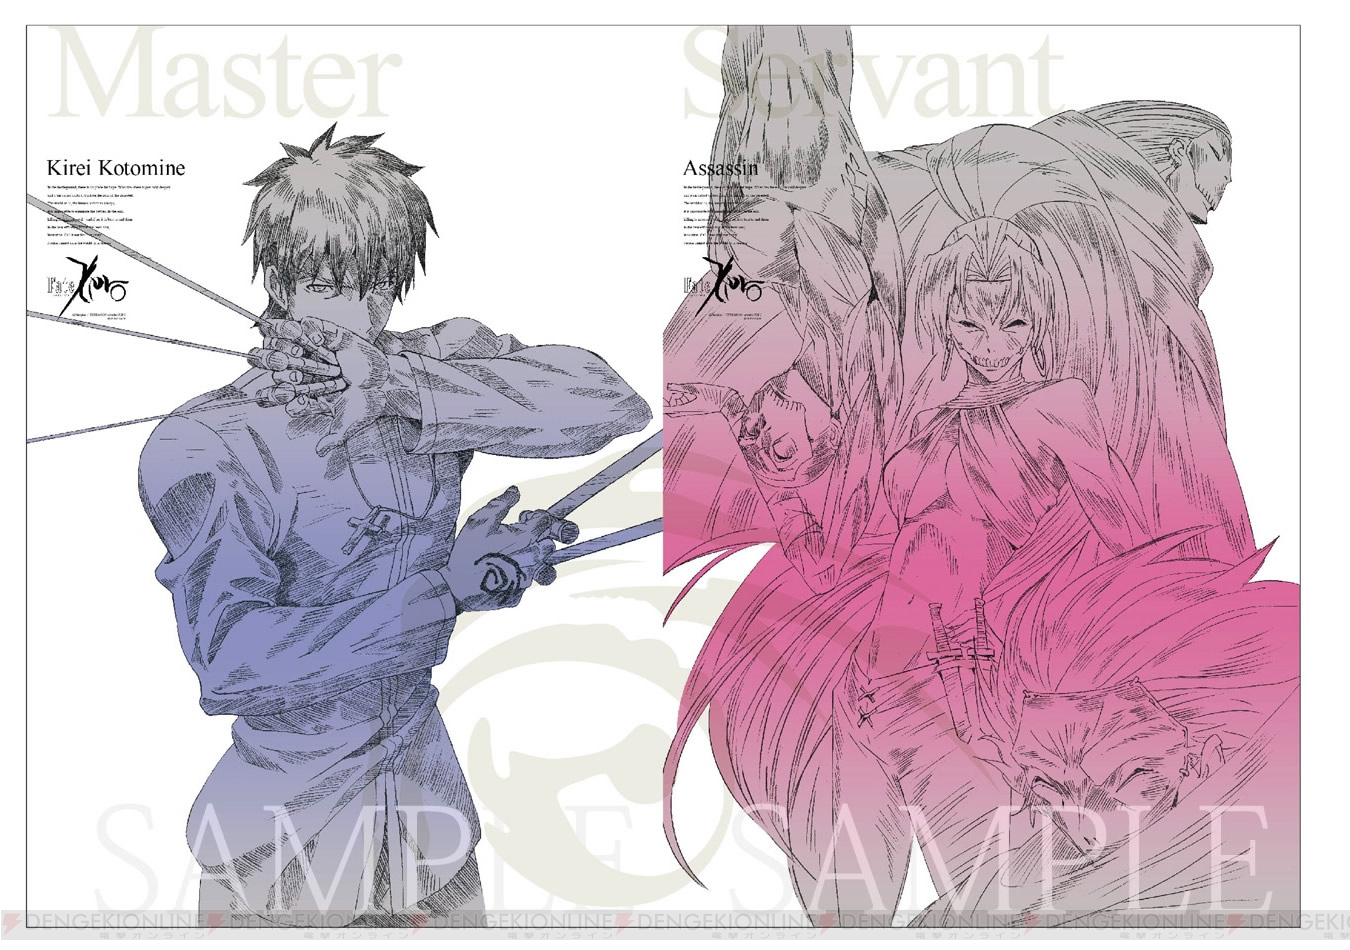 Tvアニメ Fate Zero Box Iの早期予約特典イラスト全種が公開 電撃オンライン